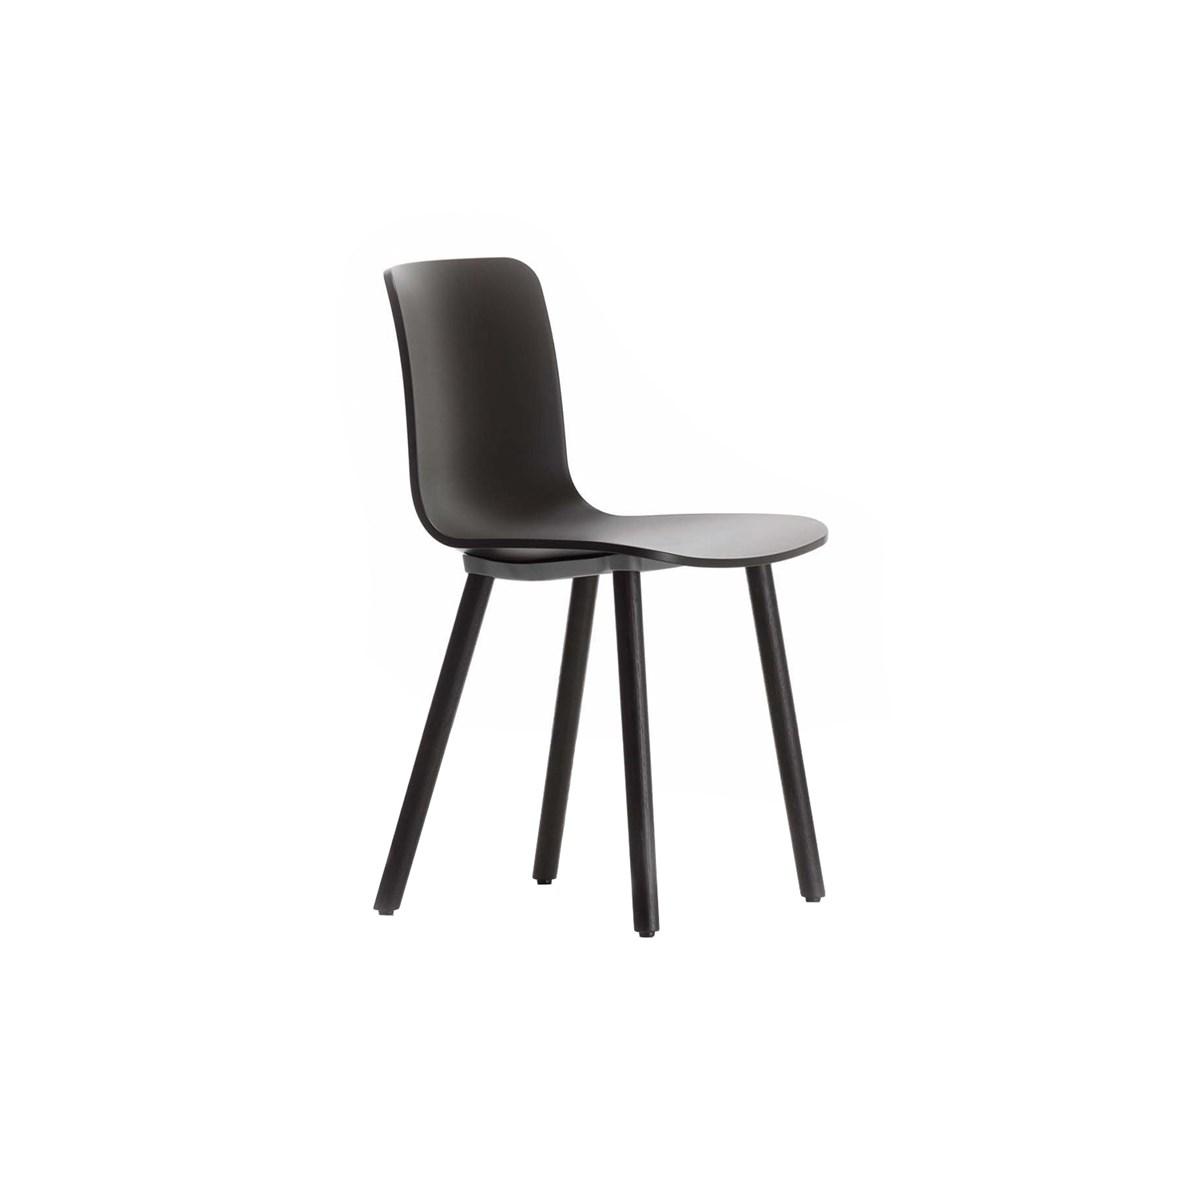 Vitra-Jasper-Morrison-Hal-Wood-Chairs-Matisse-1